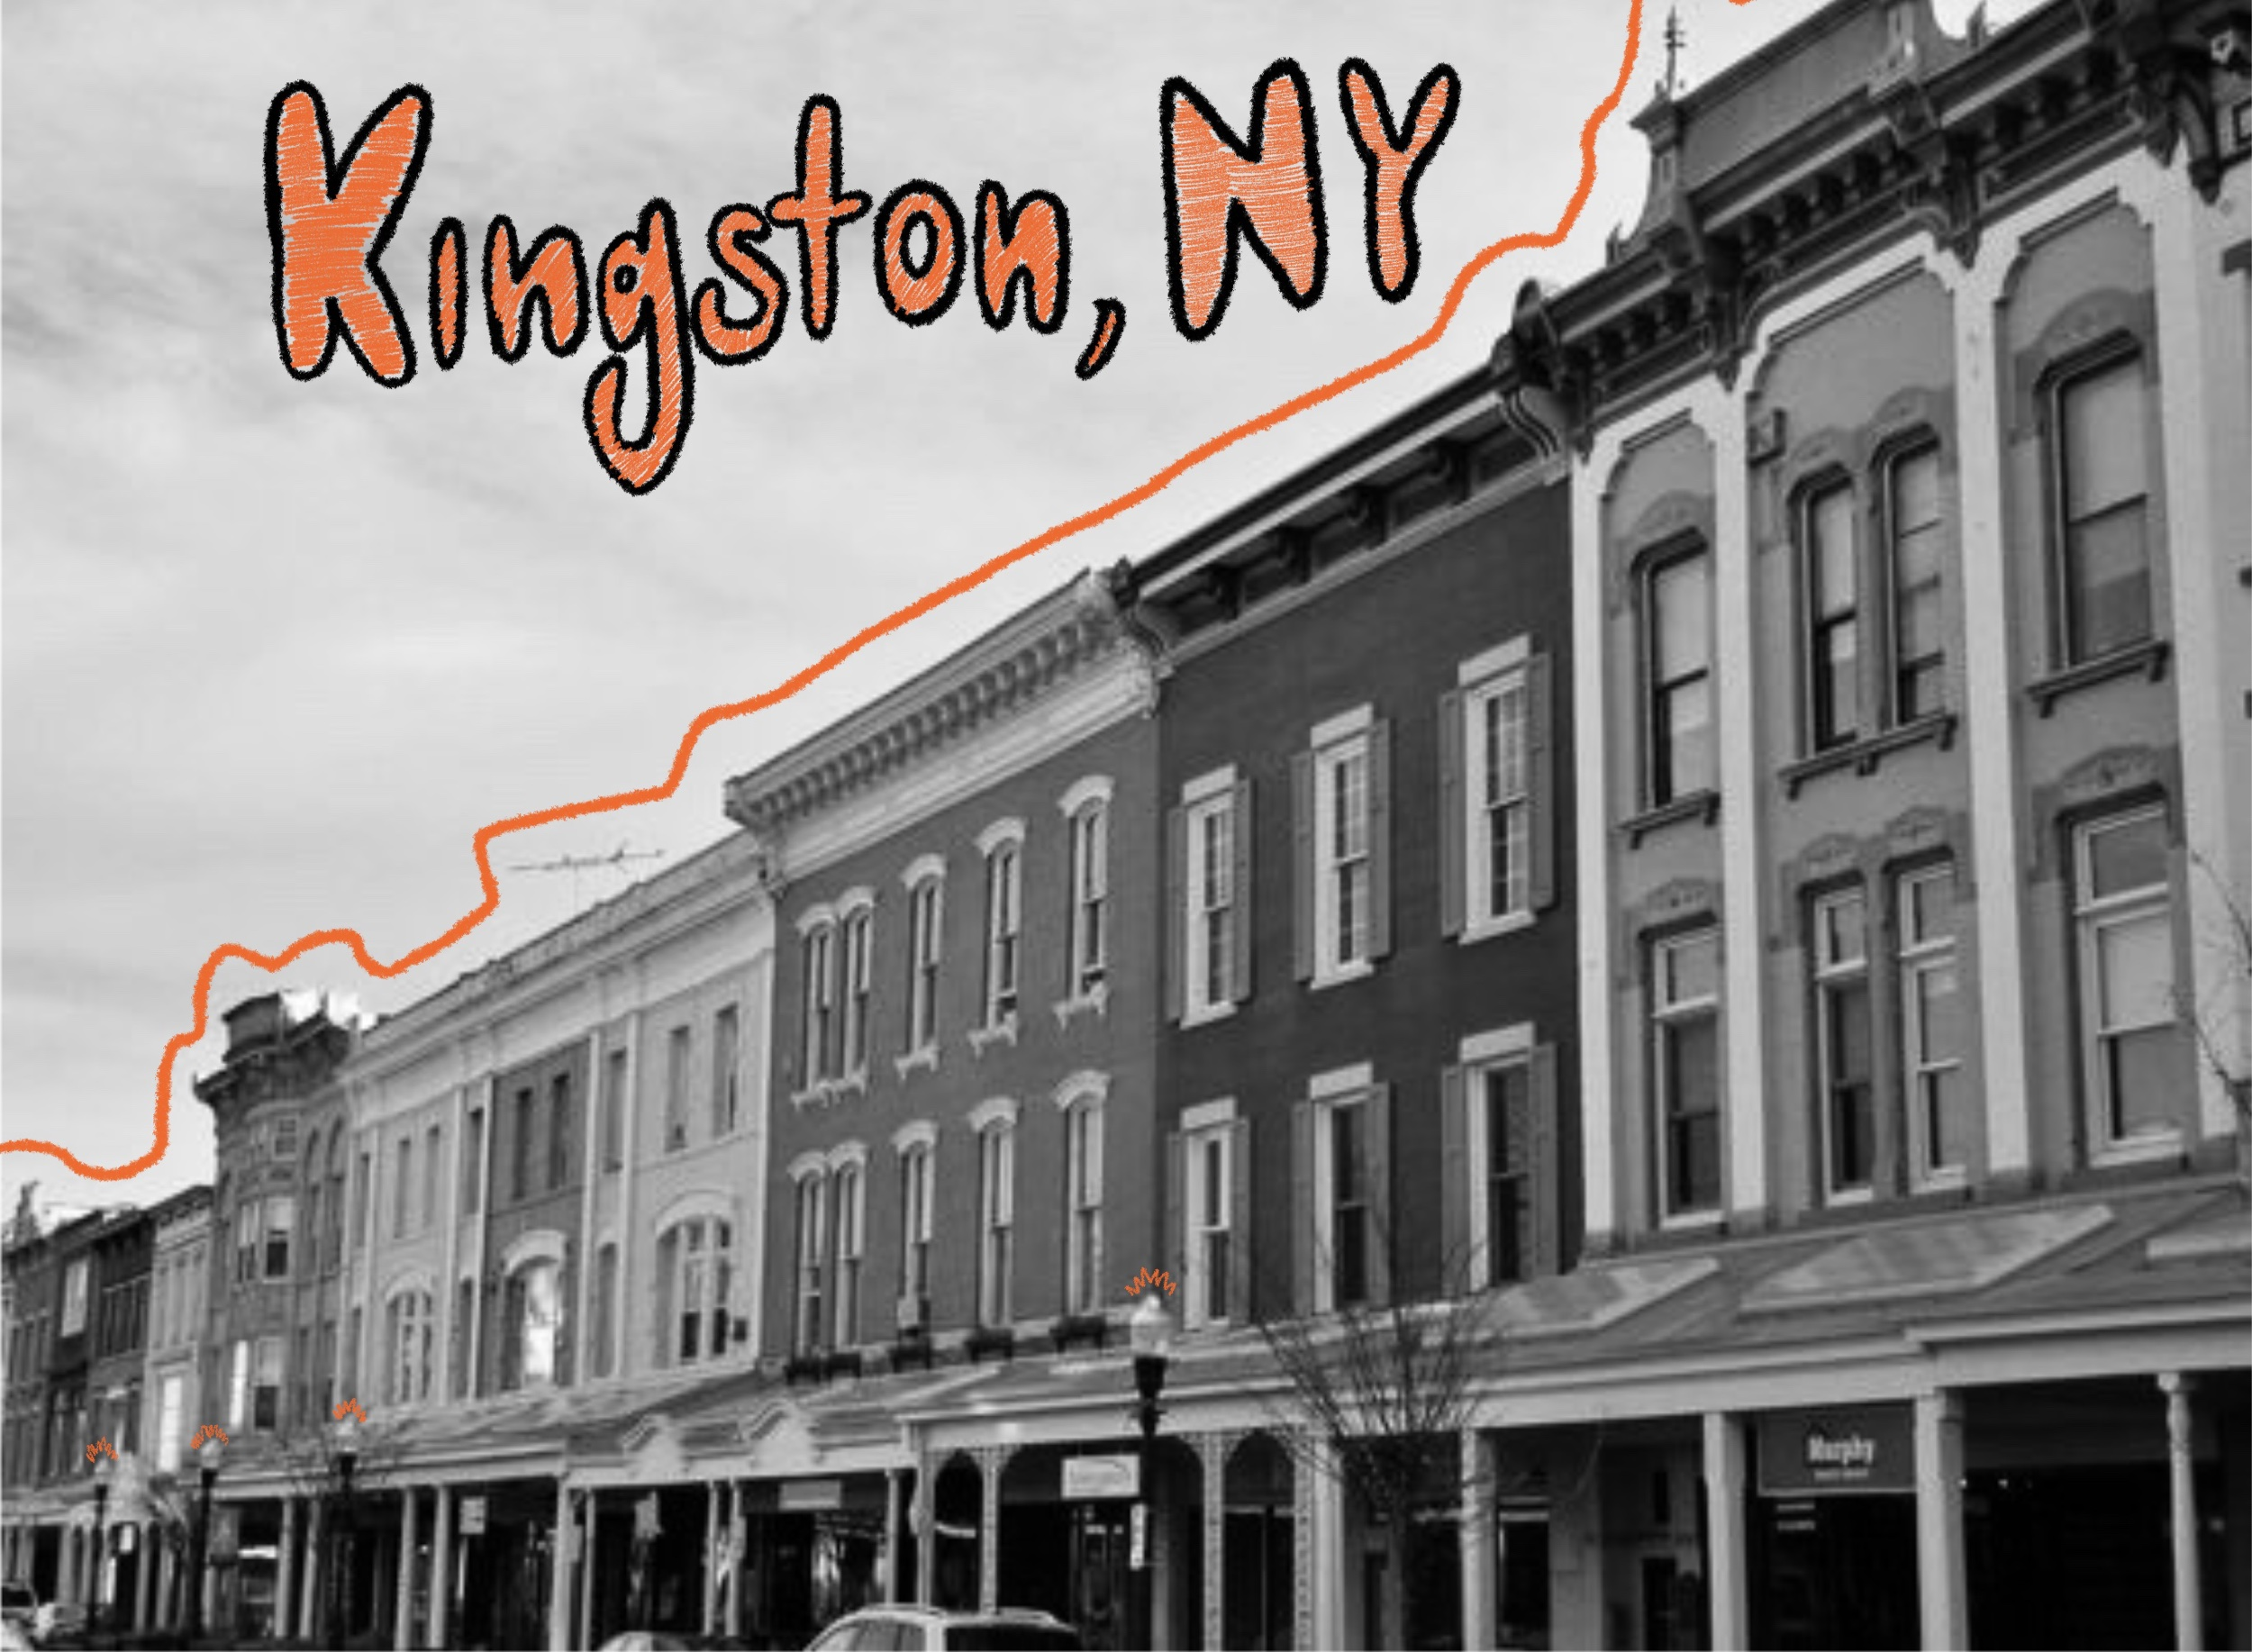 Kingston Stockade take their name from the Stockade District in downtown Kingston, NY.